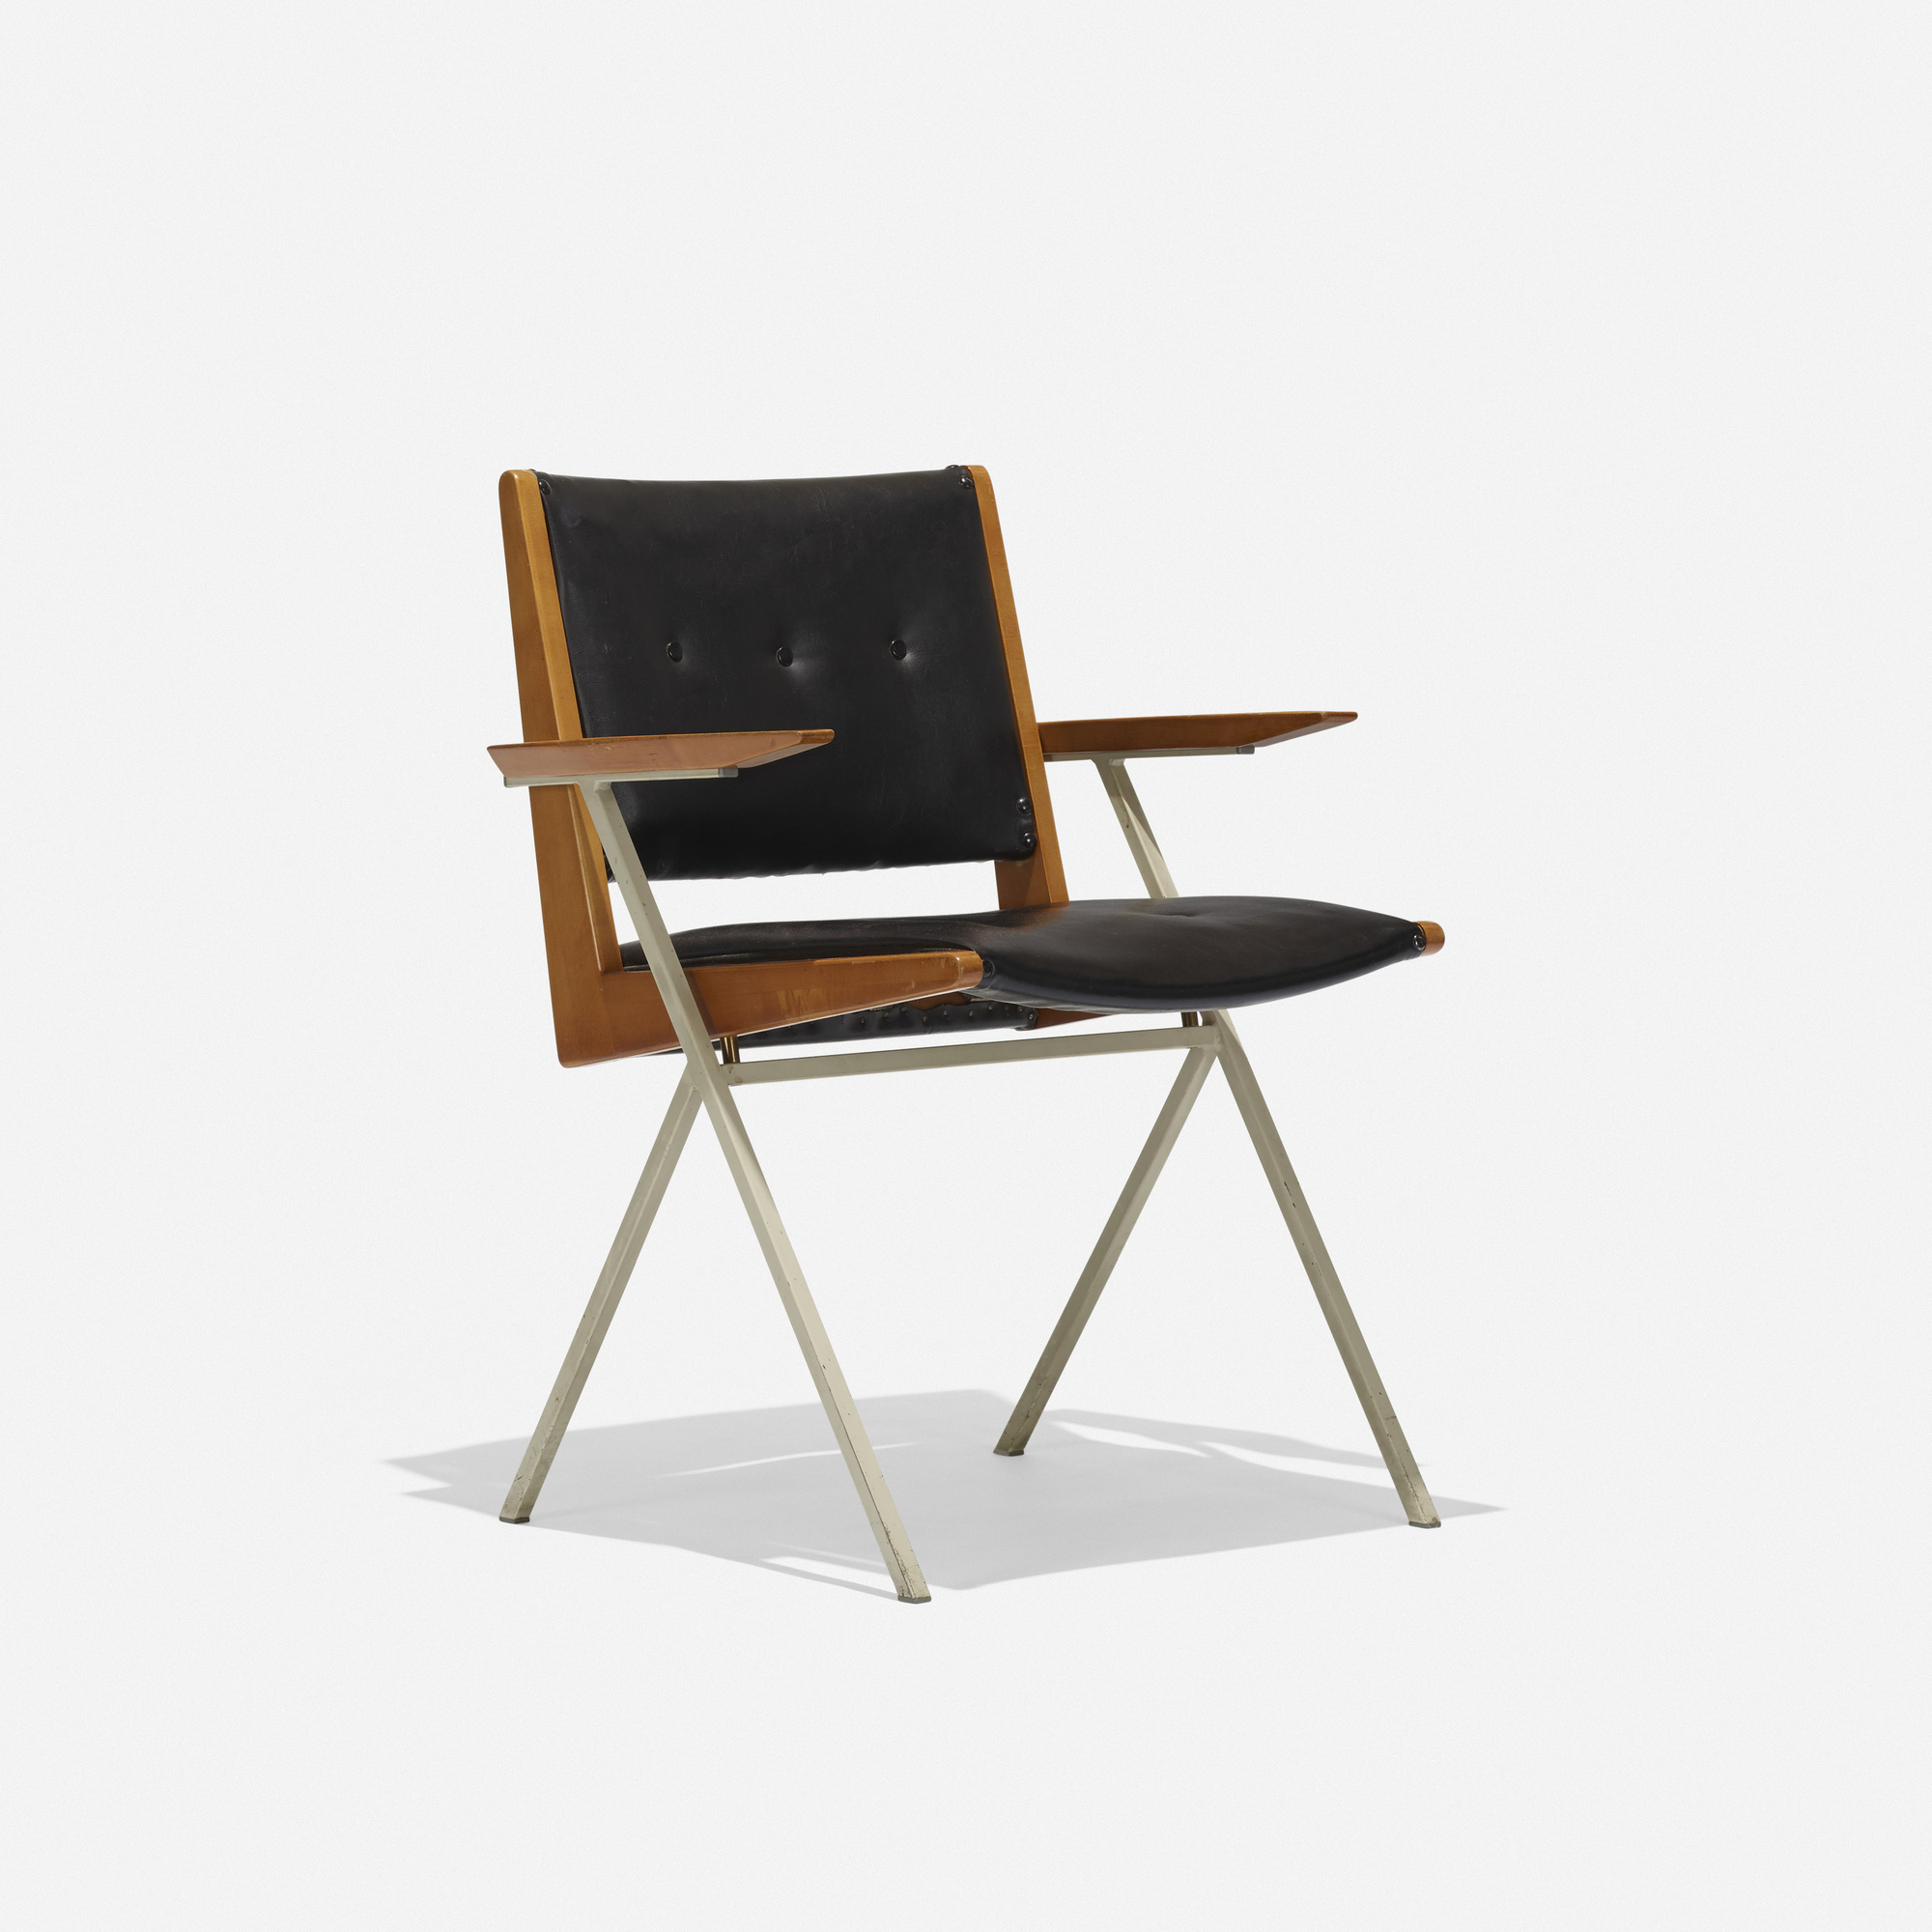 189: Ladislav Rado / armchair (1 of 3)